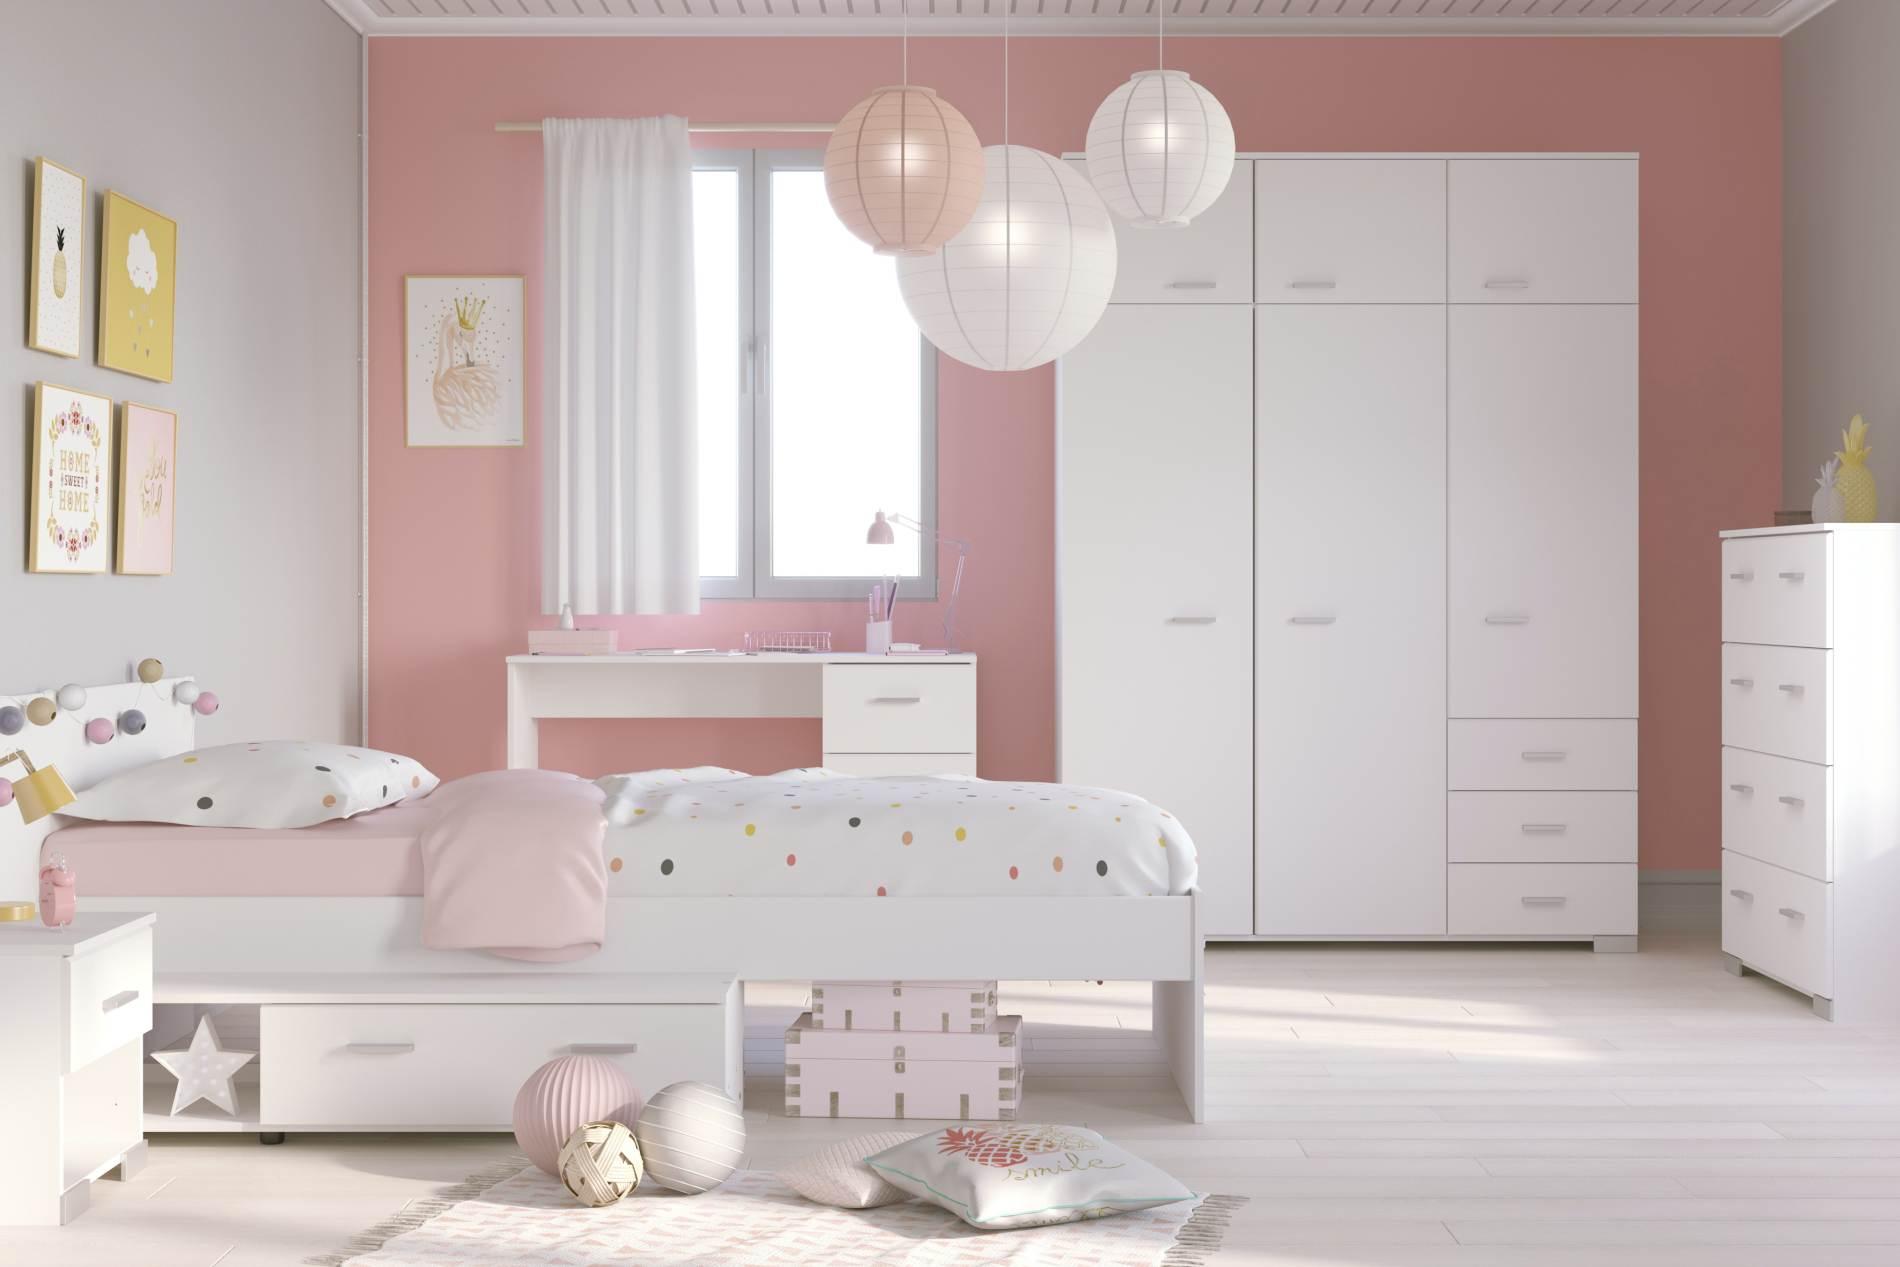 Kinderzimmer Jugendzimmer Galaxy 151a Komplettset 5 Teilig Weiss